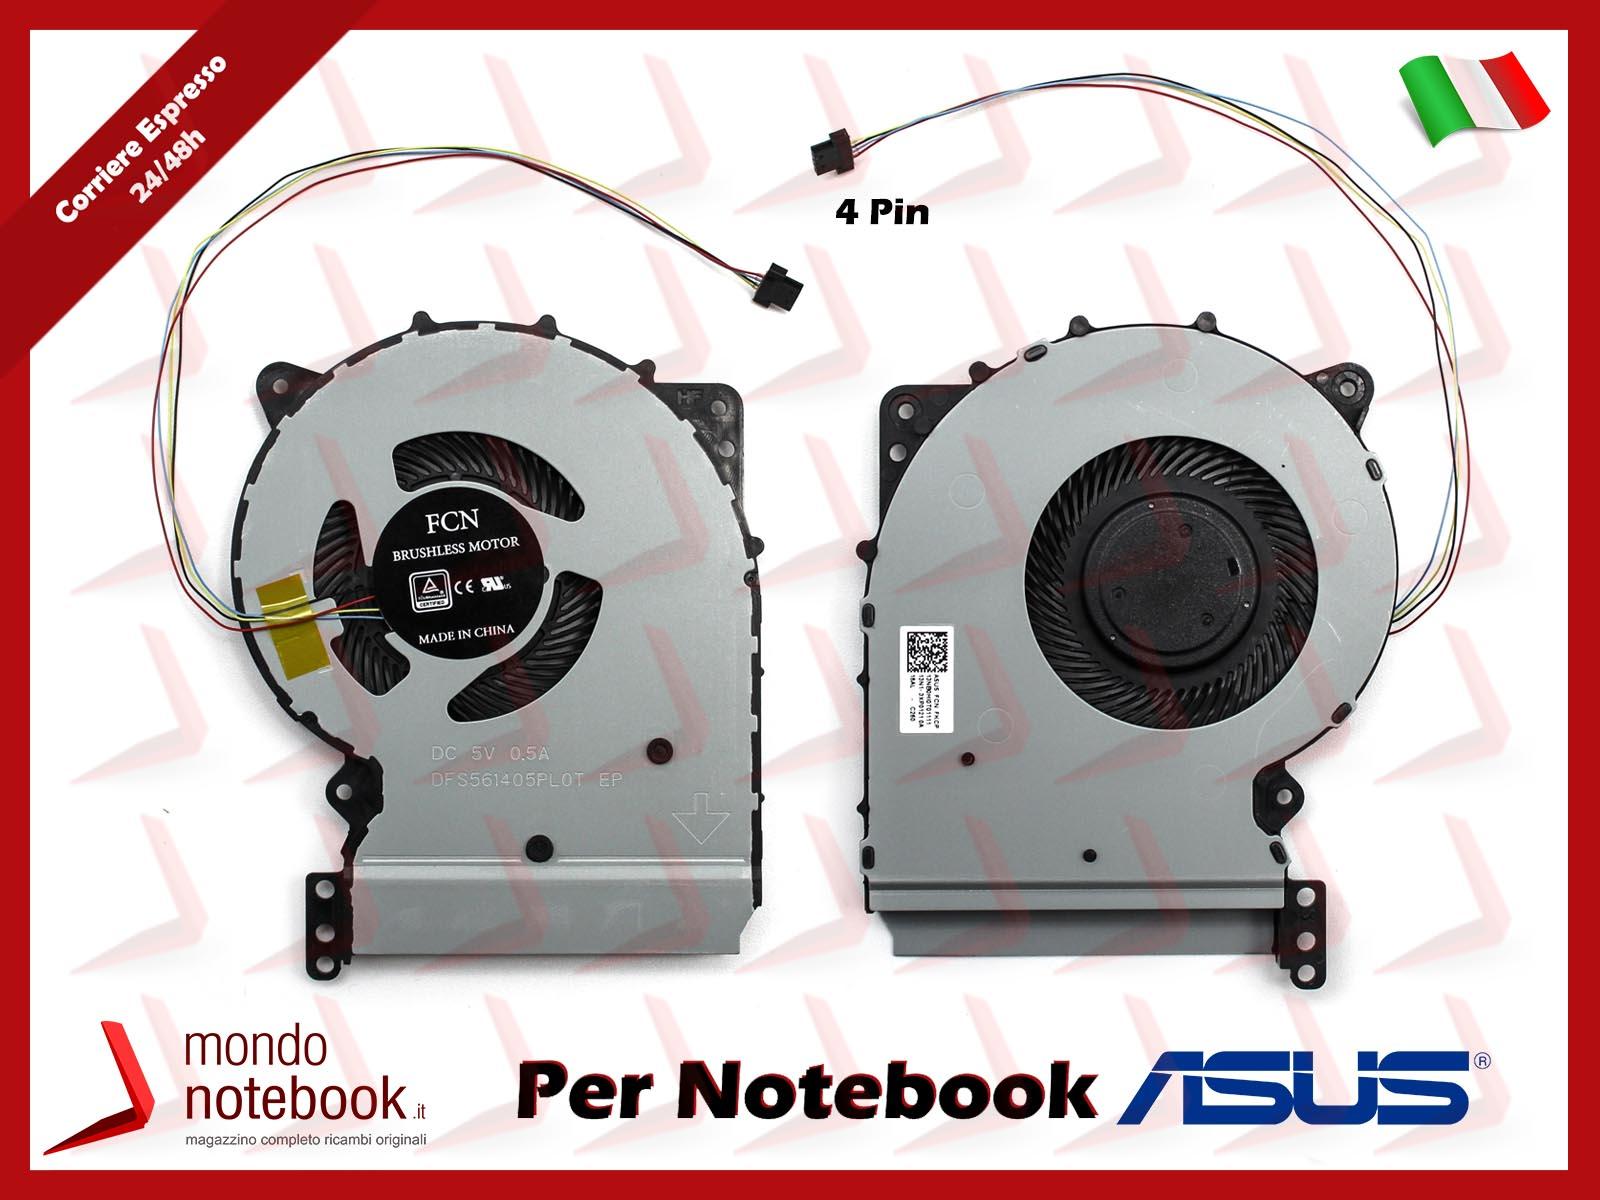 https://www.mondonotebook.it/11875/bottom-case-scocca-cover-inferiore-hp-15-bs-15-bw.jpg